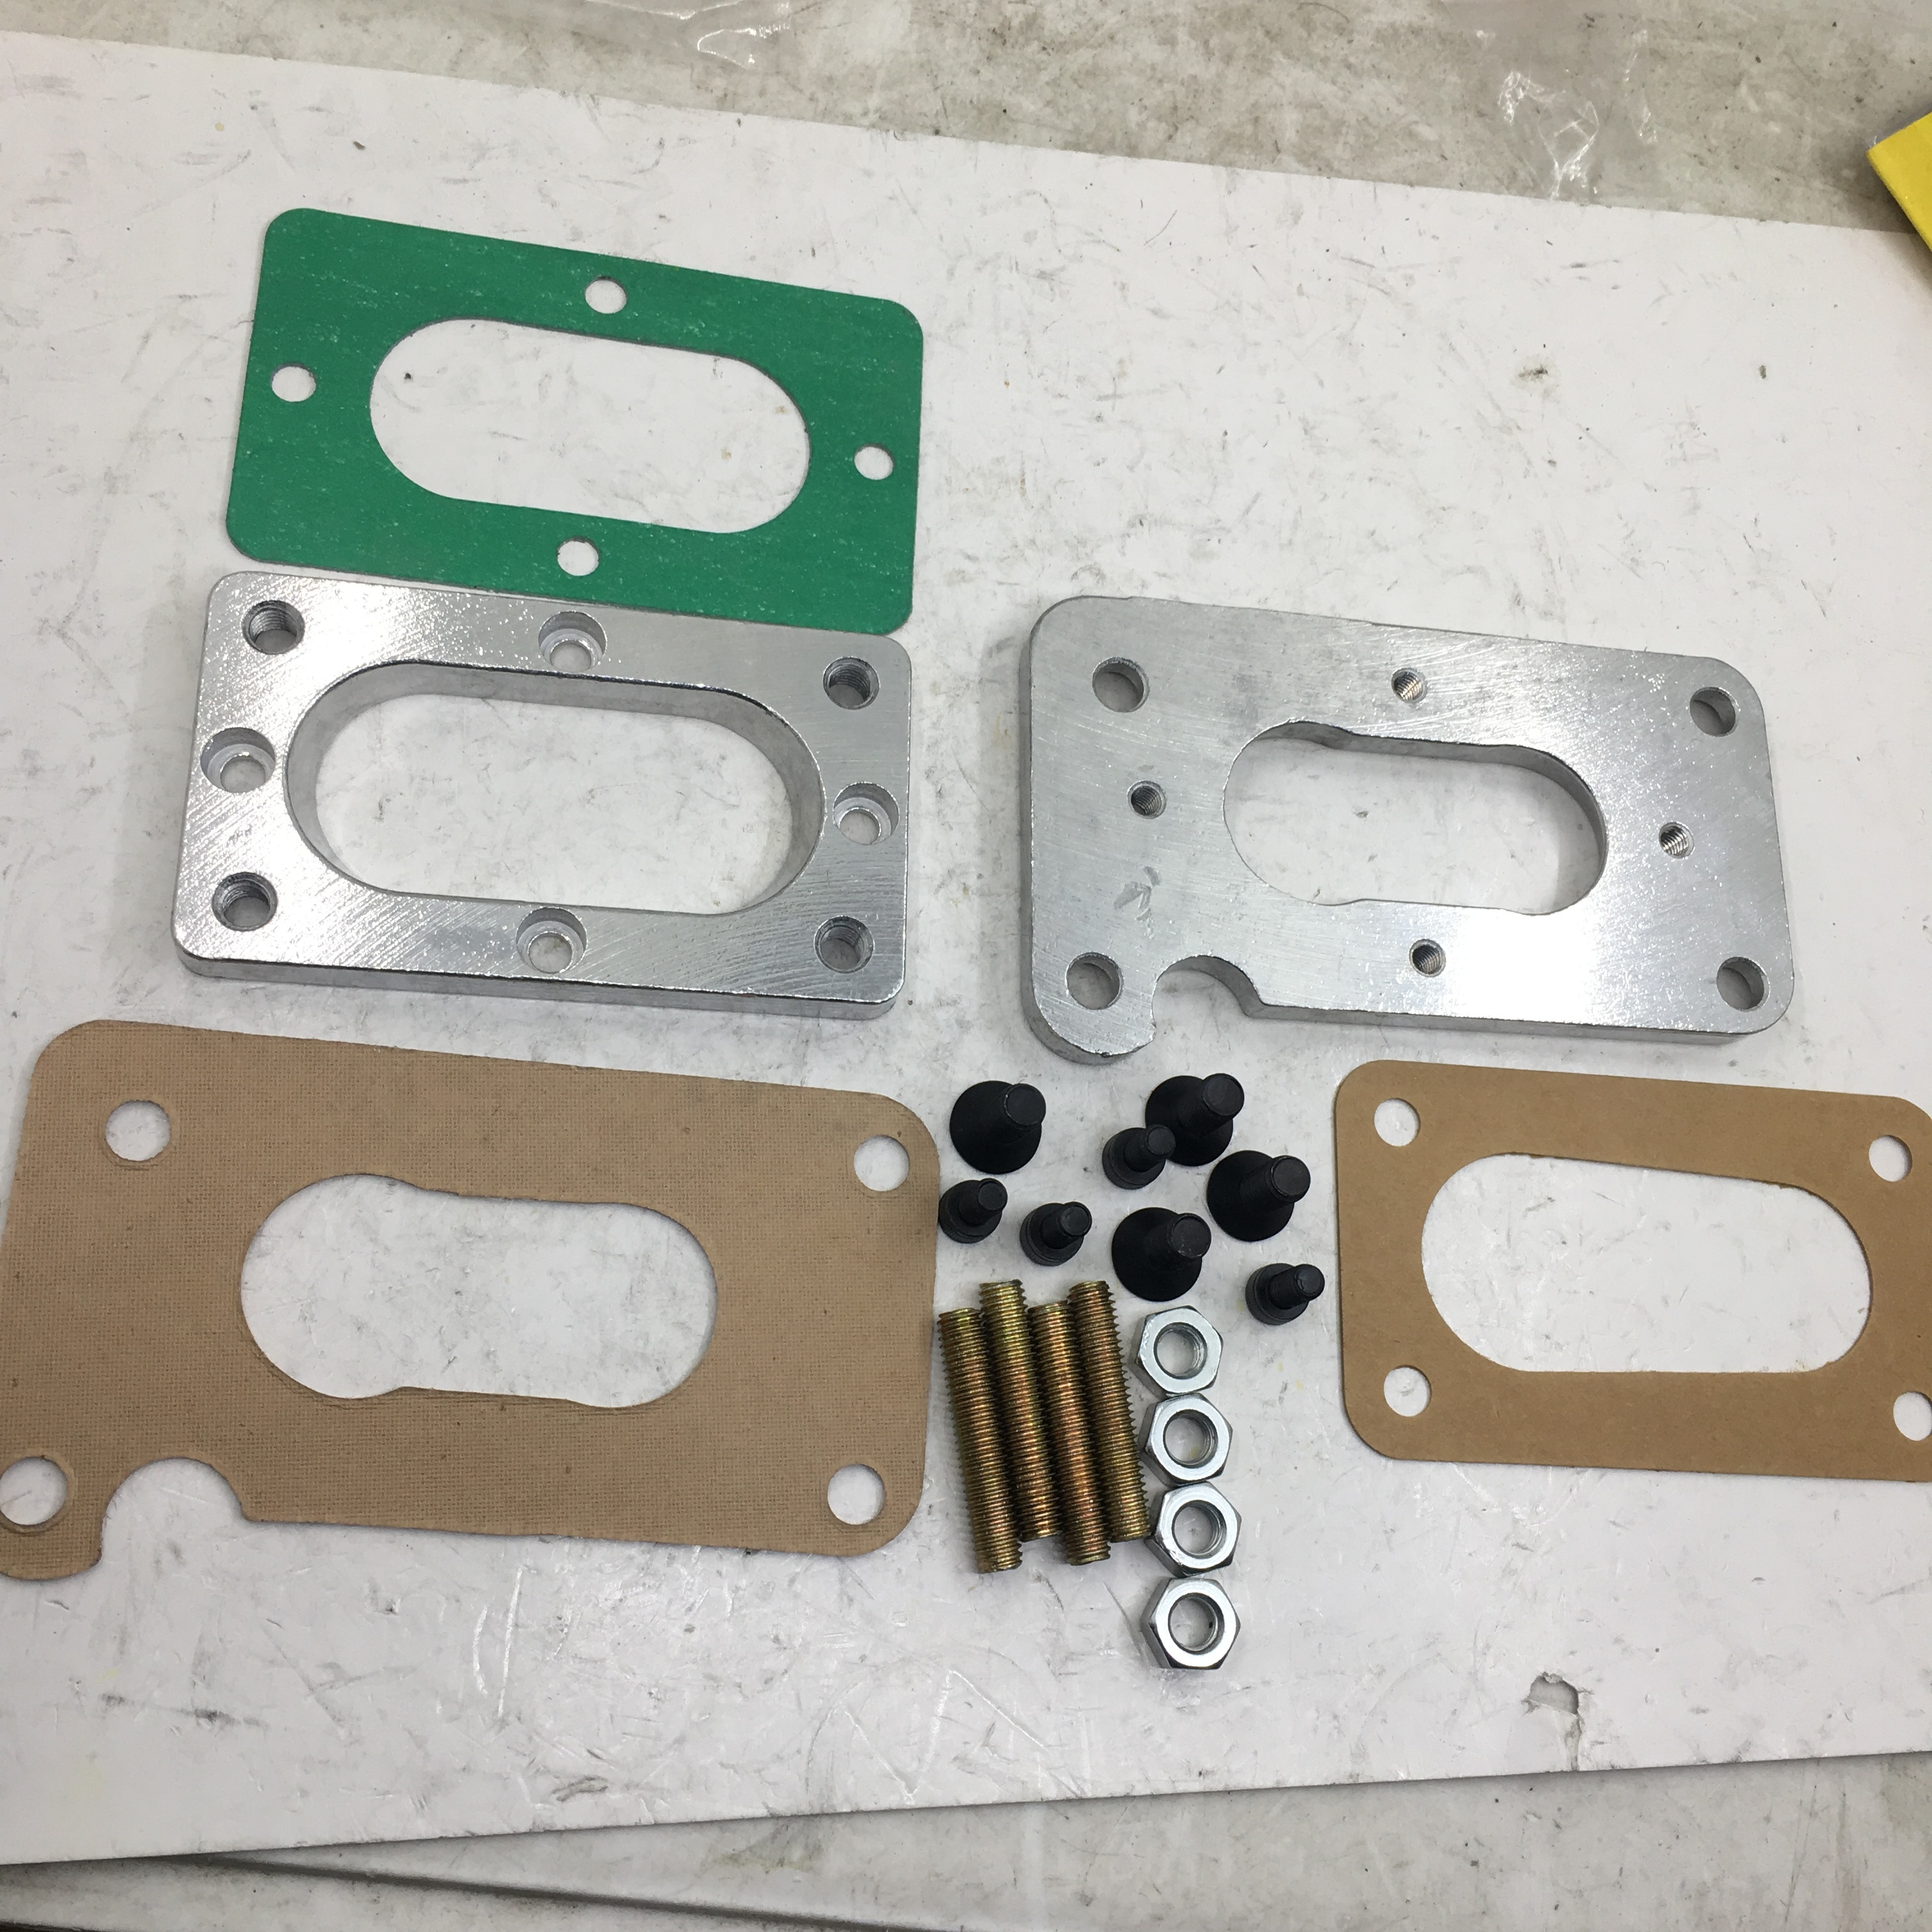 Sherryberg fajs empi weber carb carburador kit adaptador para toyota nissan datsun suzuki placa para mikuni 32/36 dgev dgv 38/38 dg